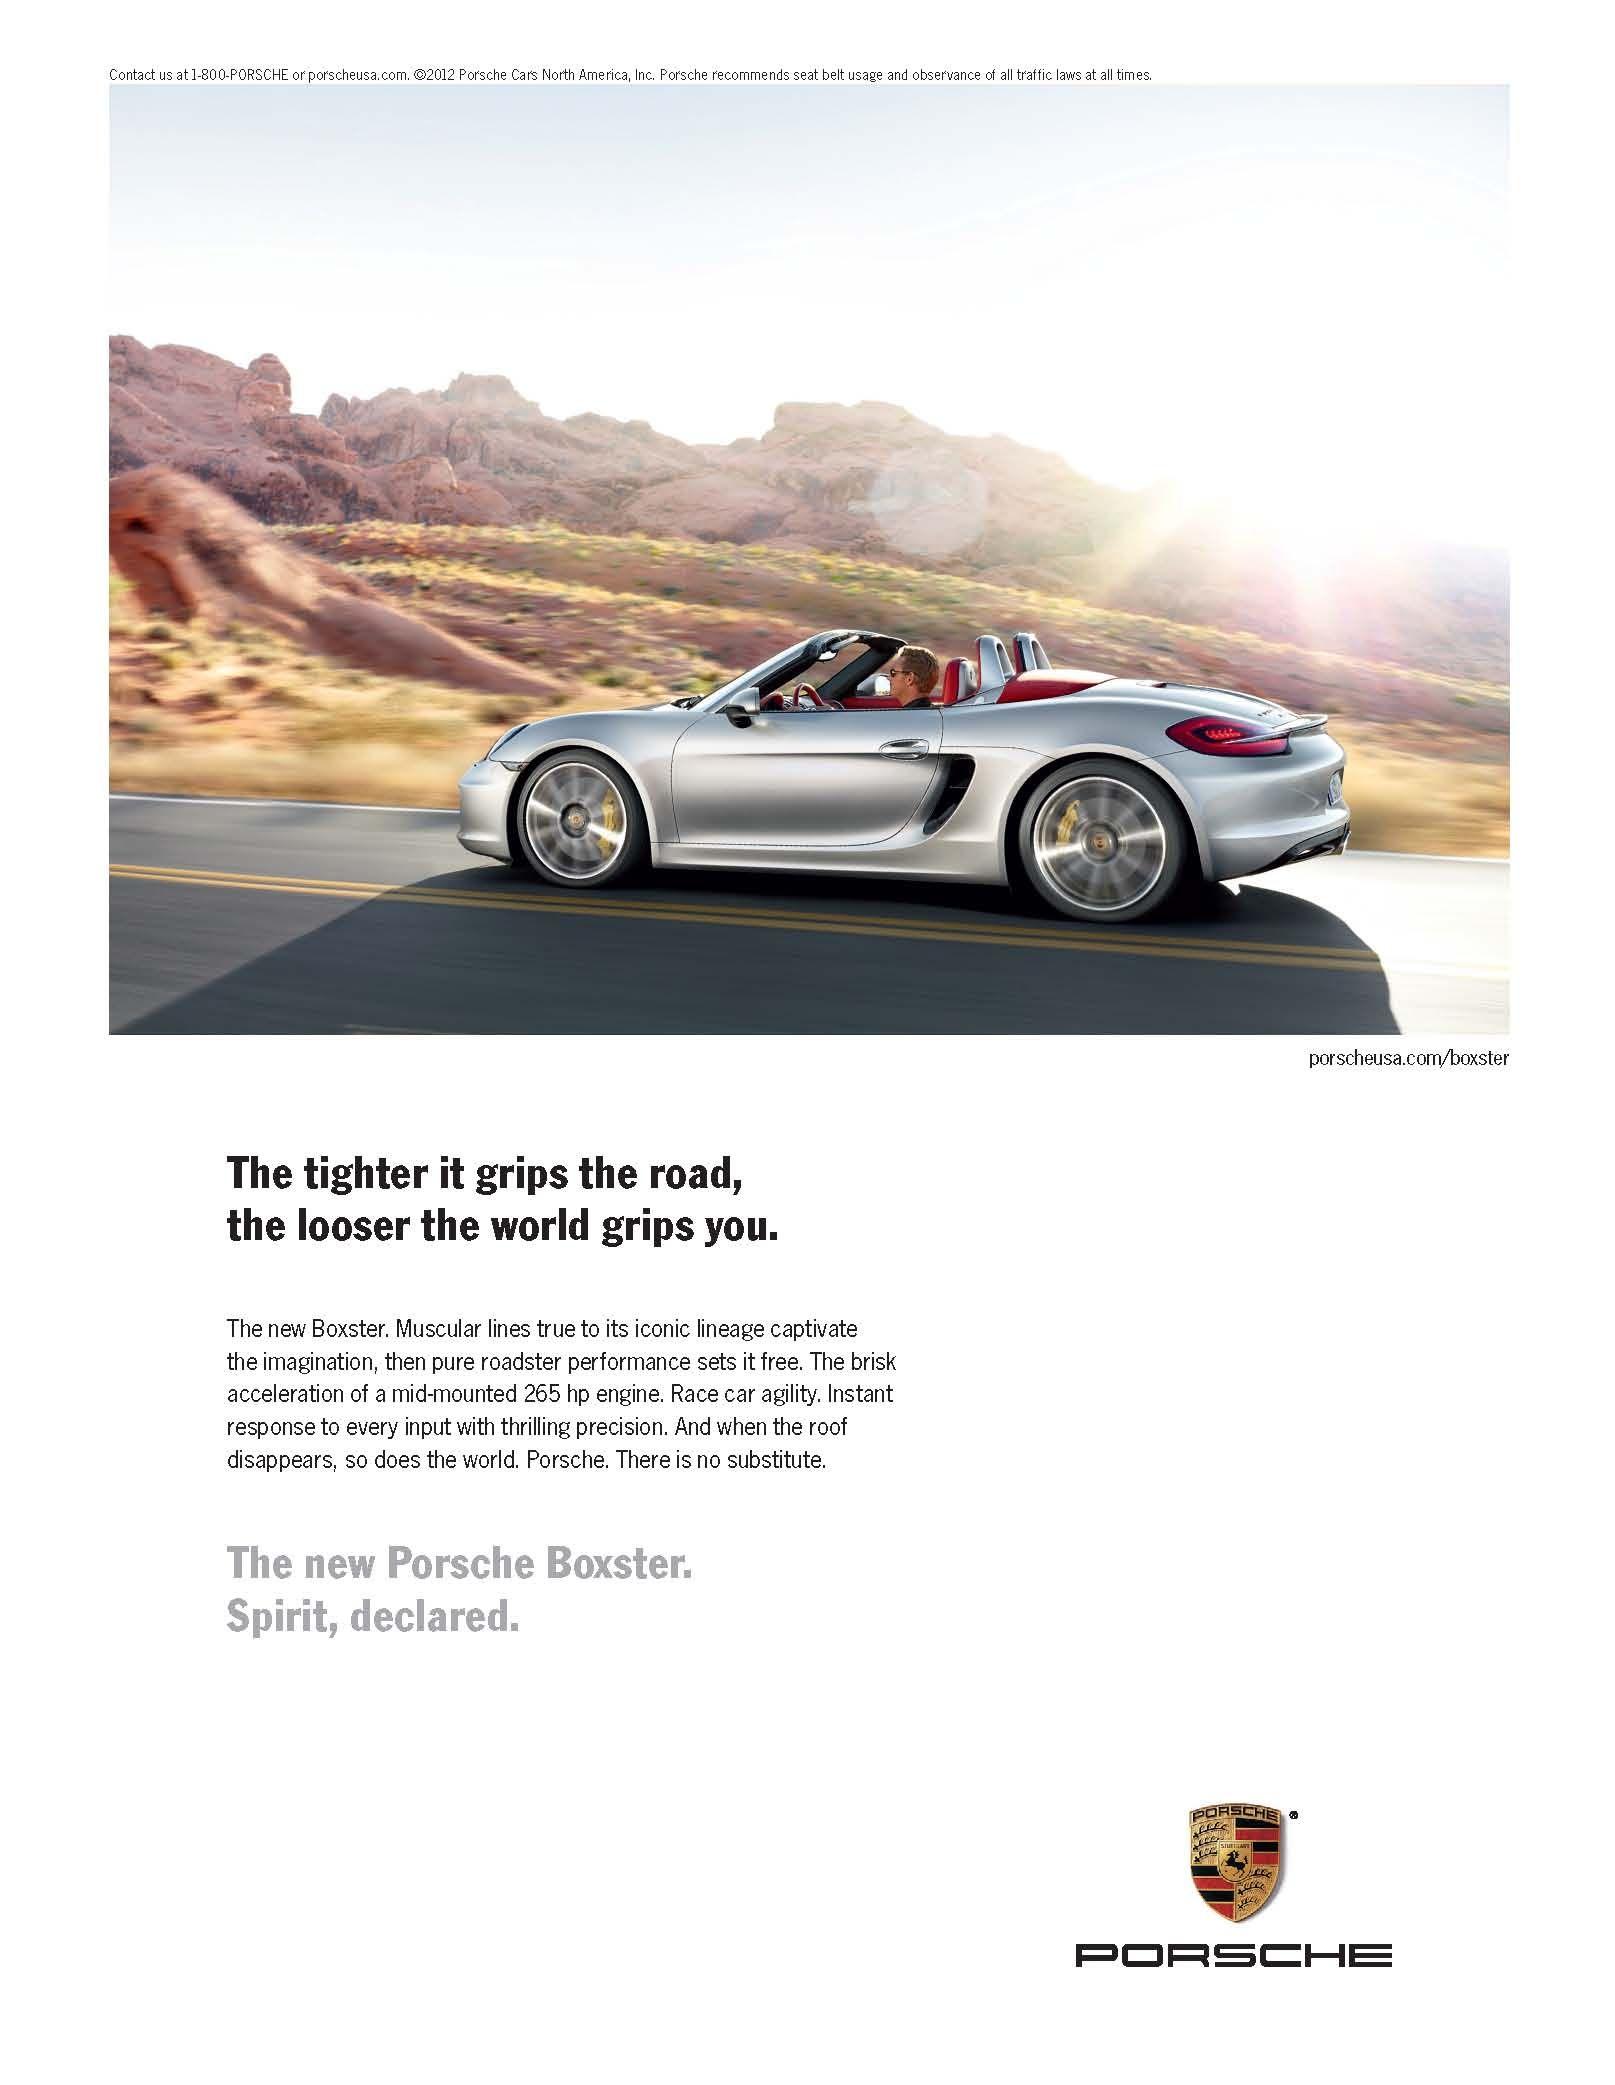 "PORSCHE OFFICIAL ORIGINAL 911 996 TURBO /"" SEX /"" ADVERTISING  POSTER 2003 USA."